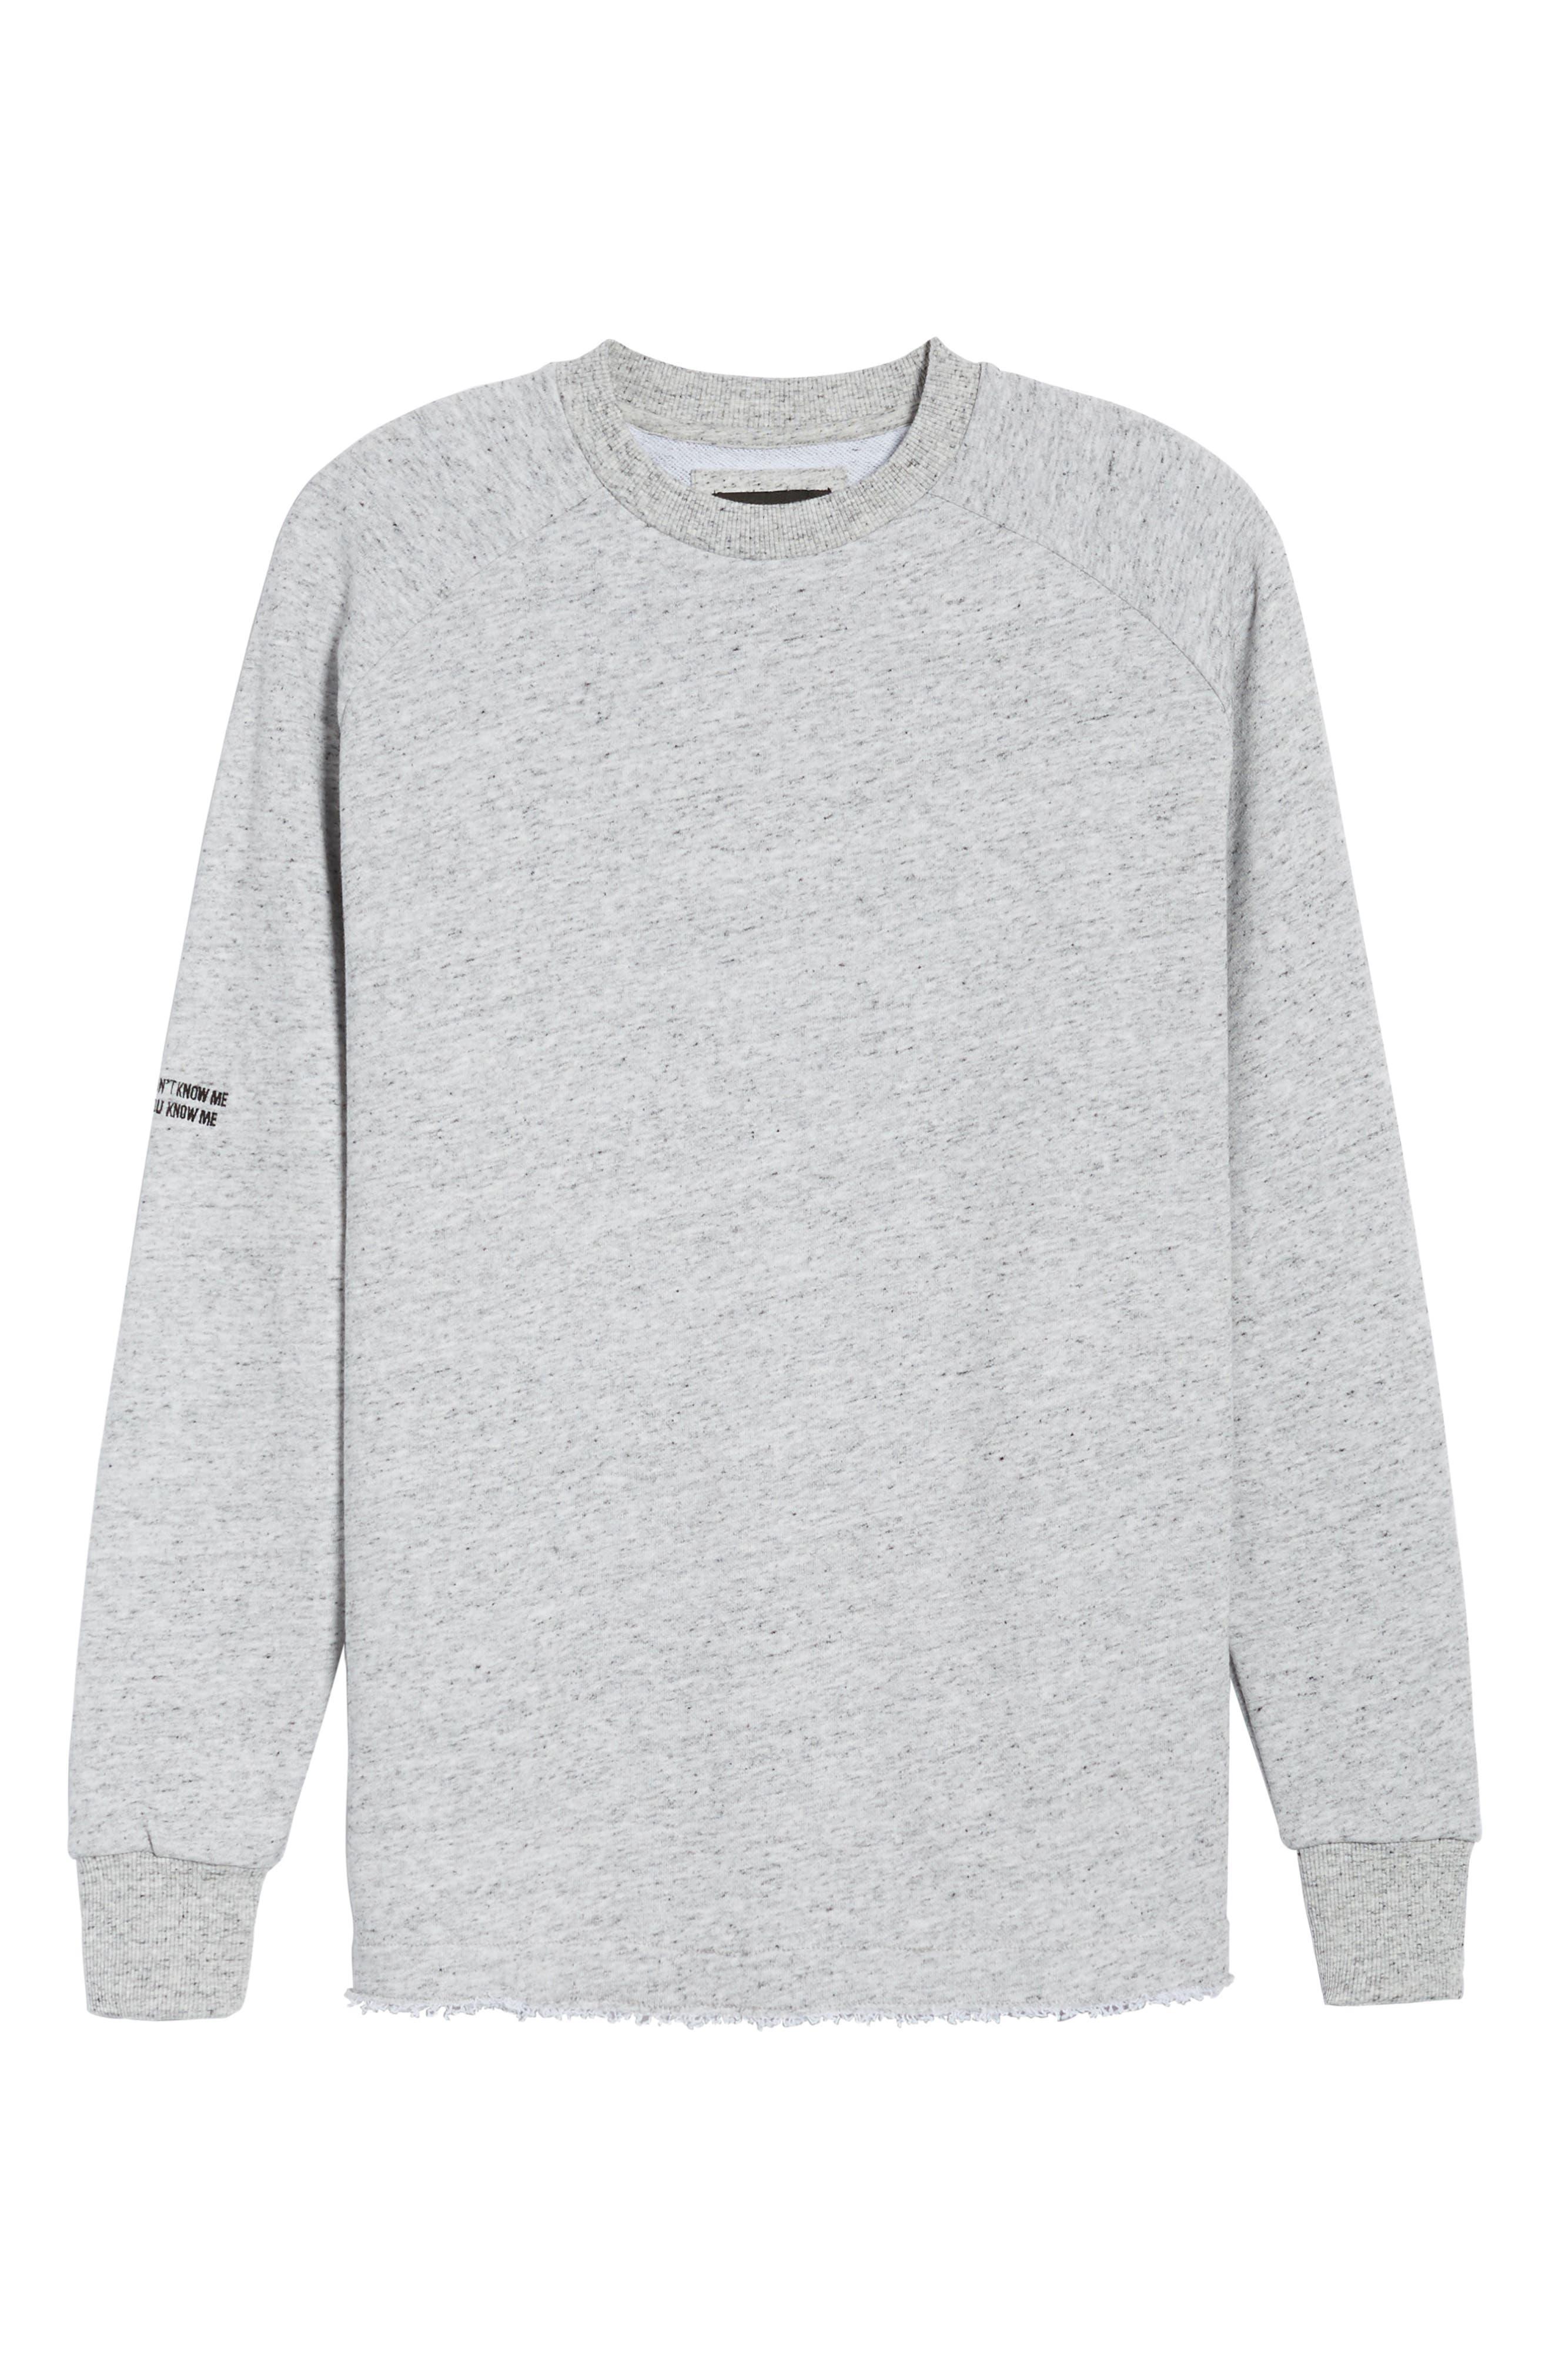 Torn Crew Sweatshirt,                             Alternate thumbnail 6, color,                             059